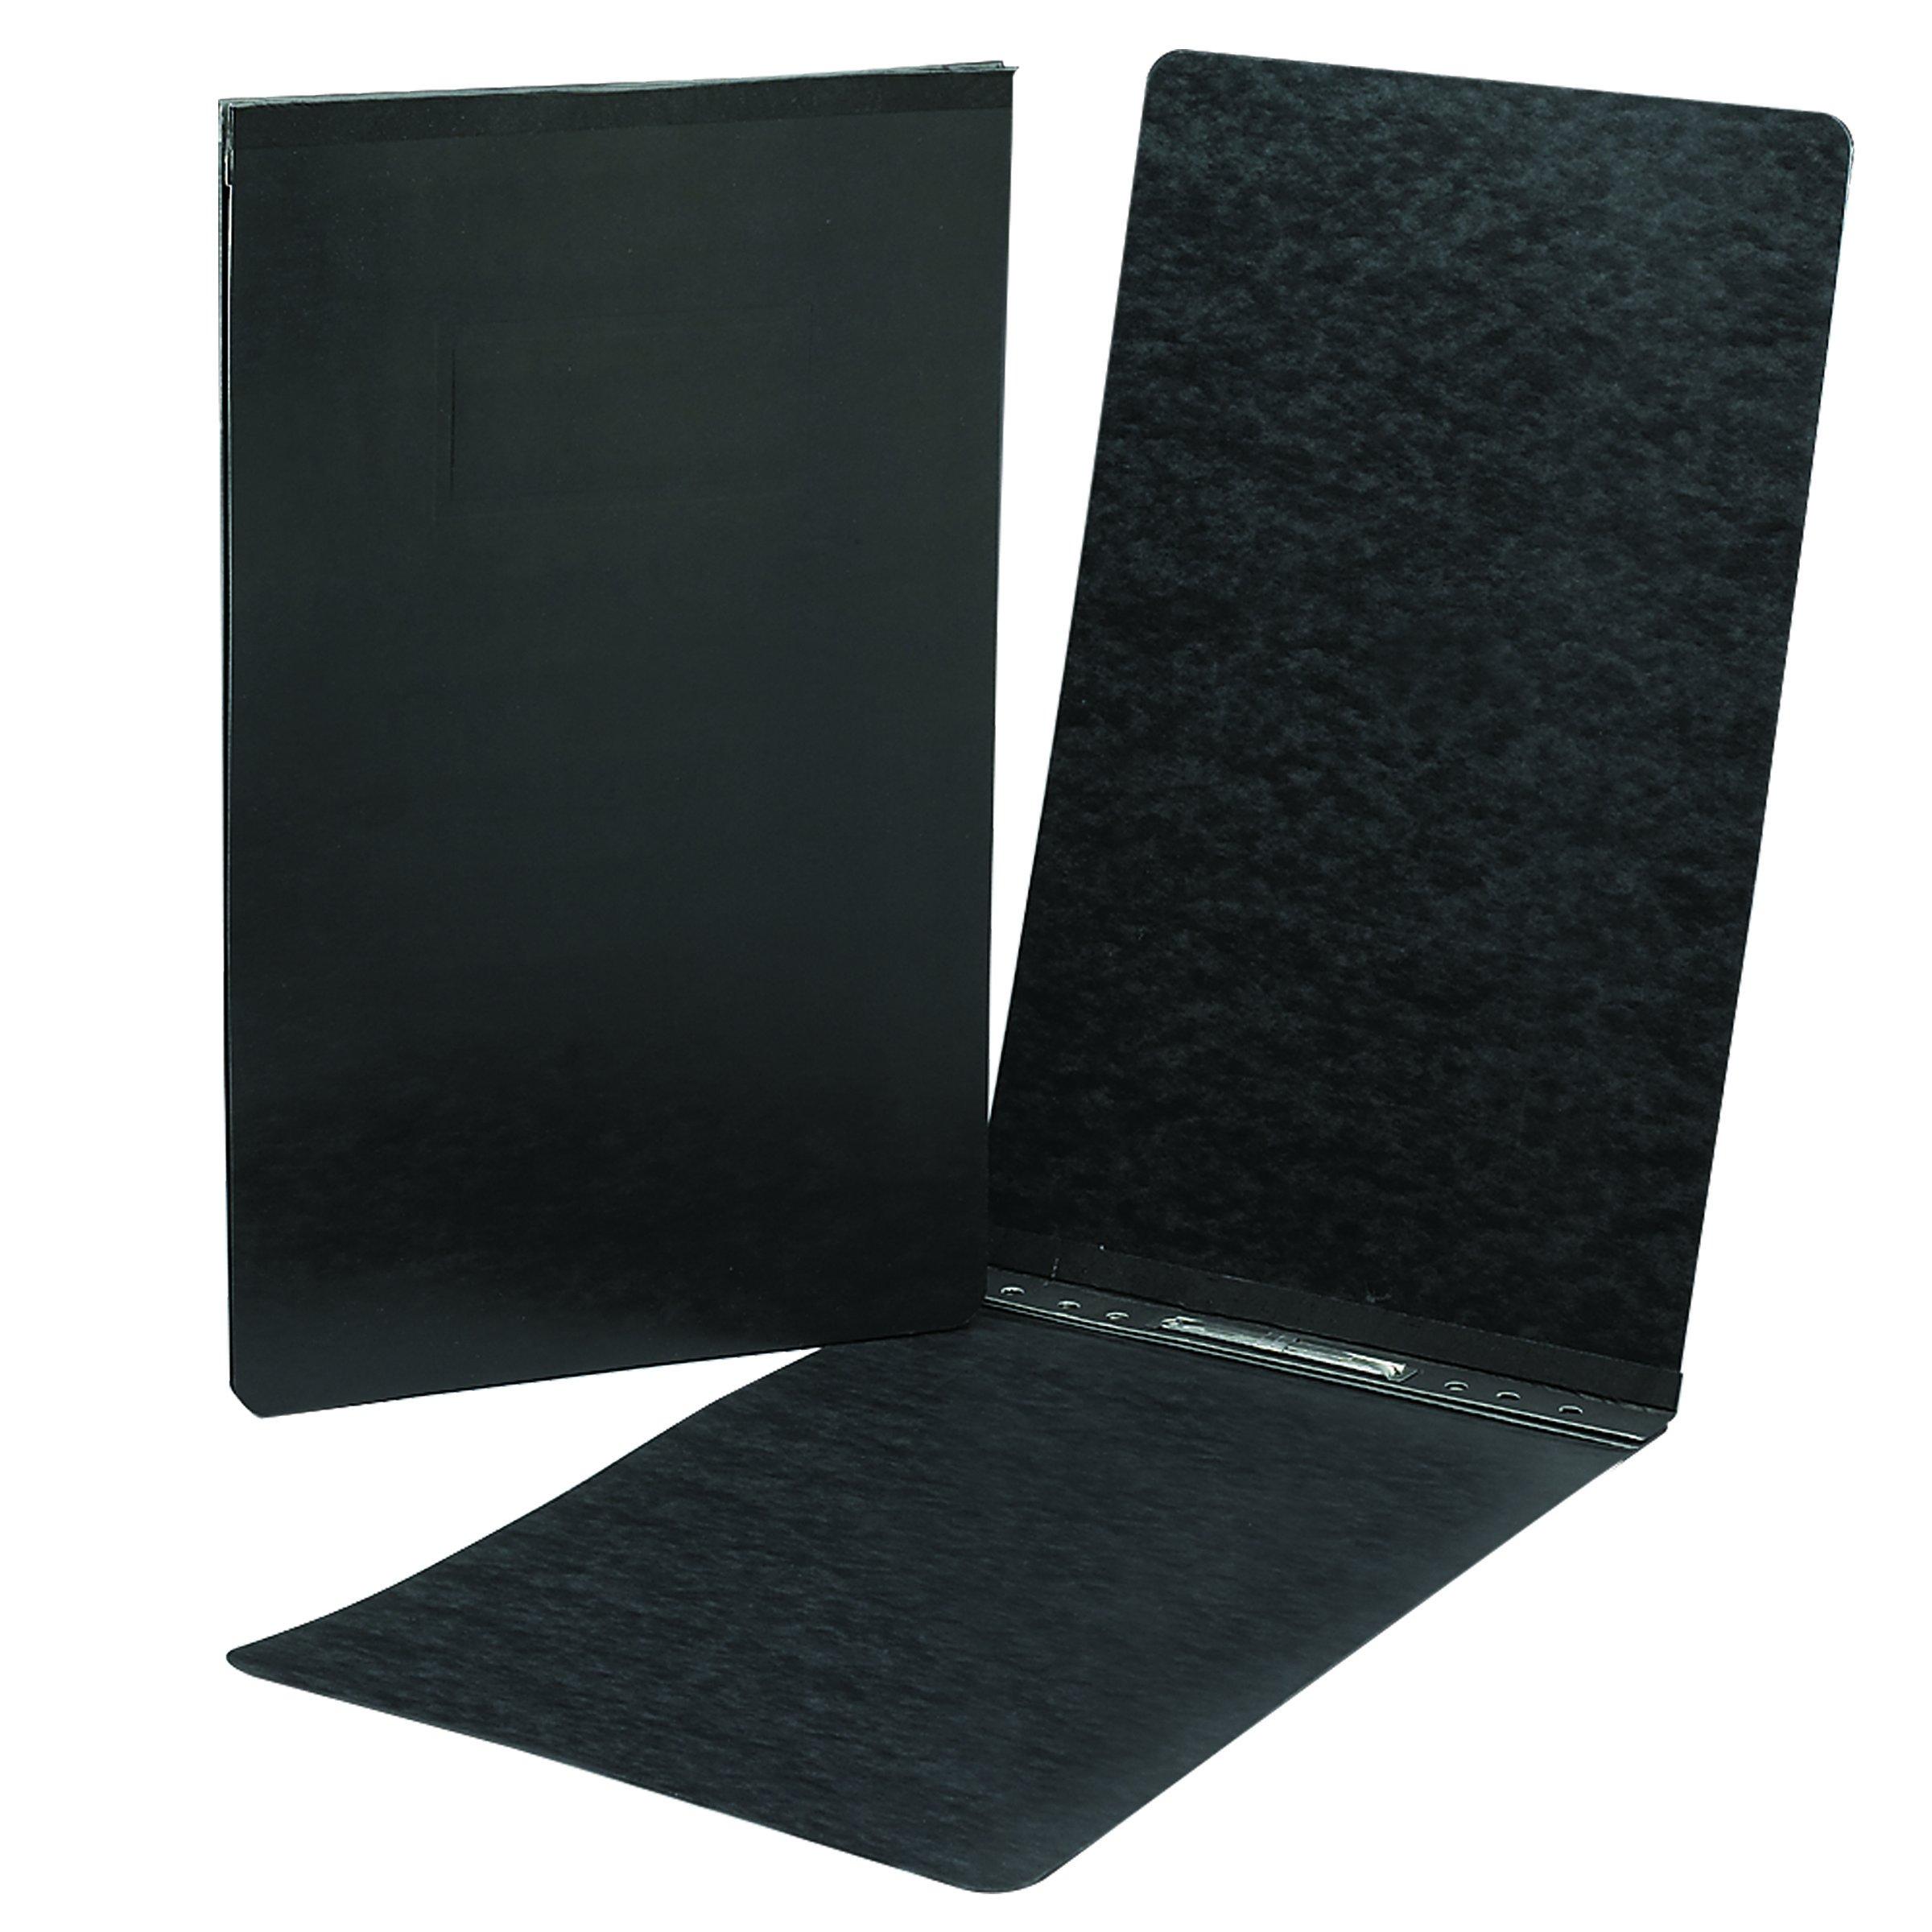 Smead PressGuard Report Cover, Metal Prong Top Fastener with Compressor, 2'' Capacity, Legal Size, Black, 25 per Box (81132)